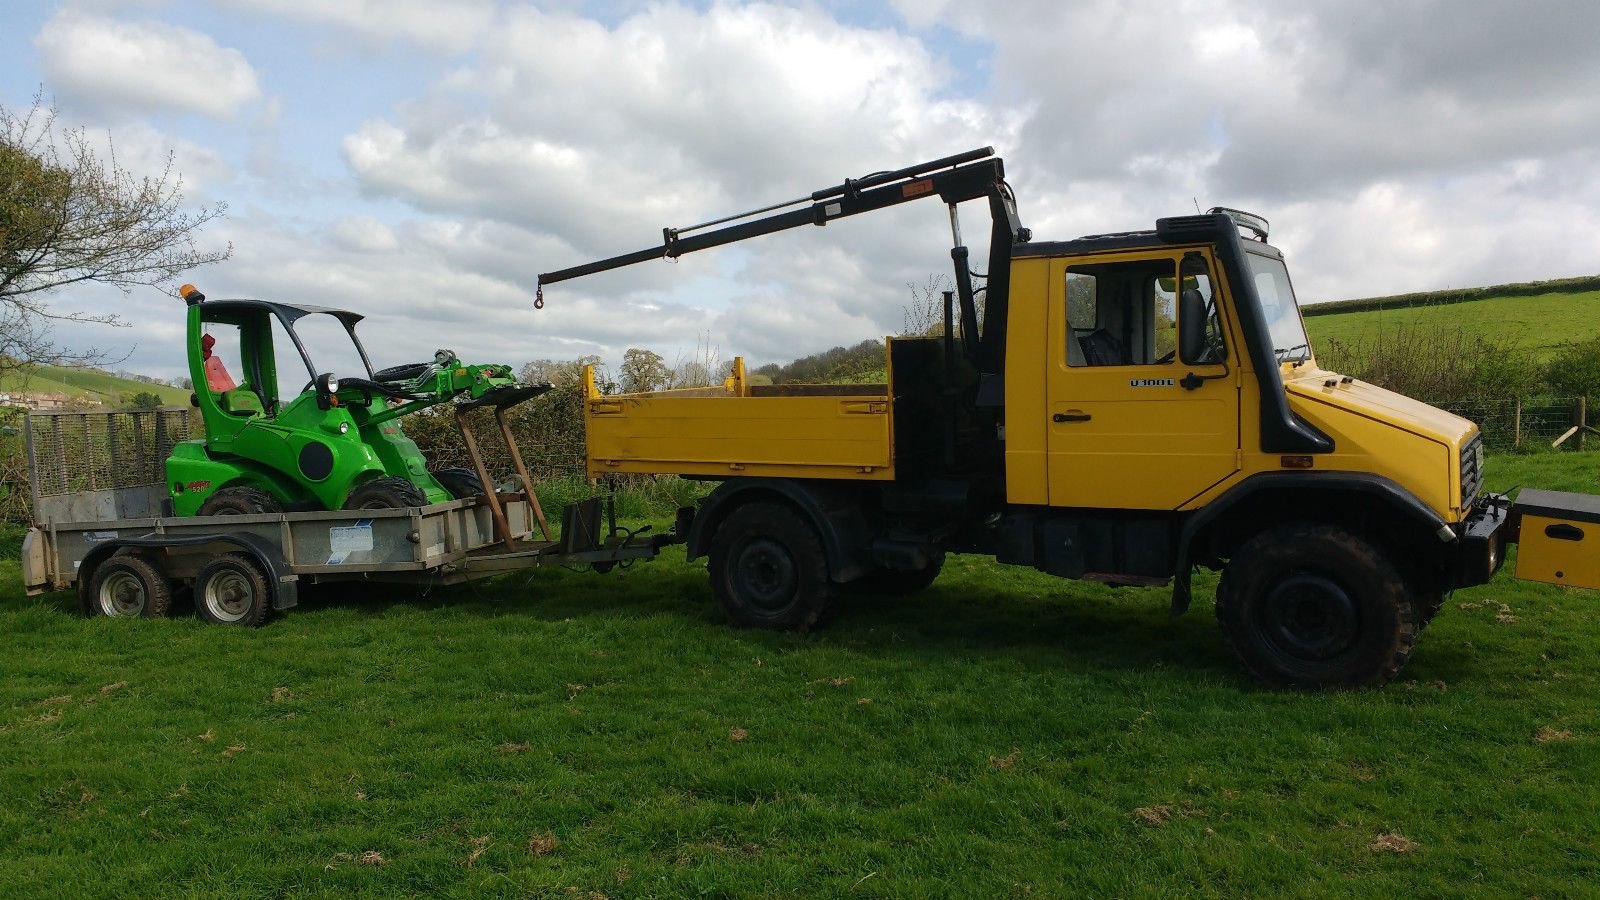 Plus ifor williams 10x6 plant trailer for sale is my very handy 1996 unimog u100l